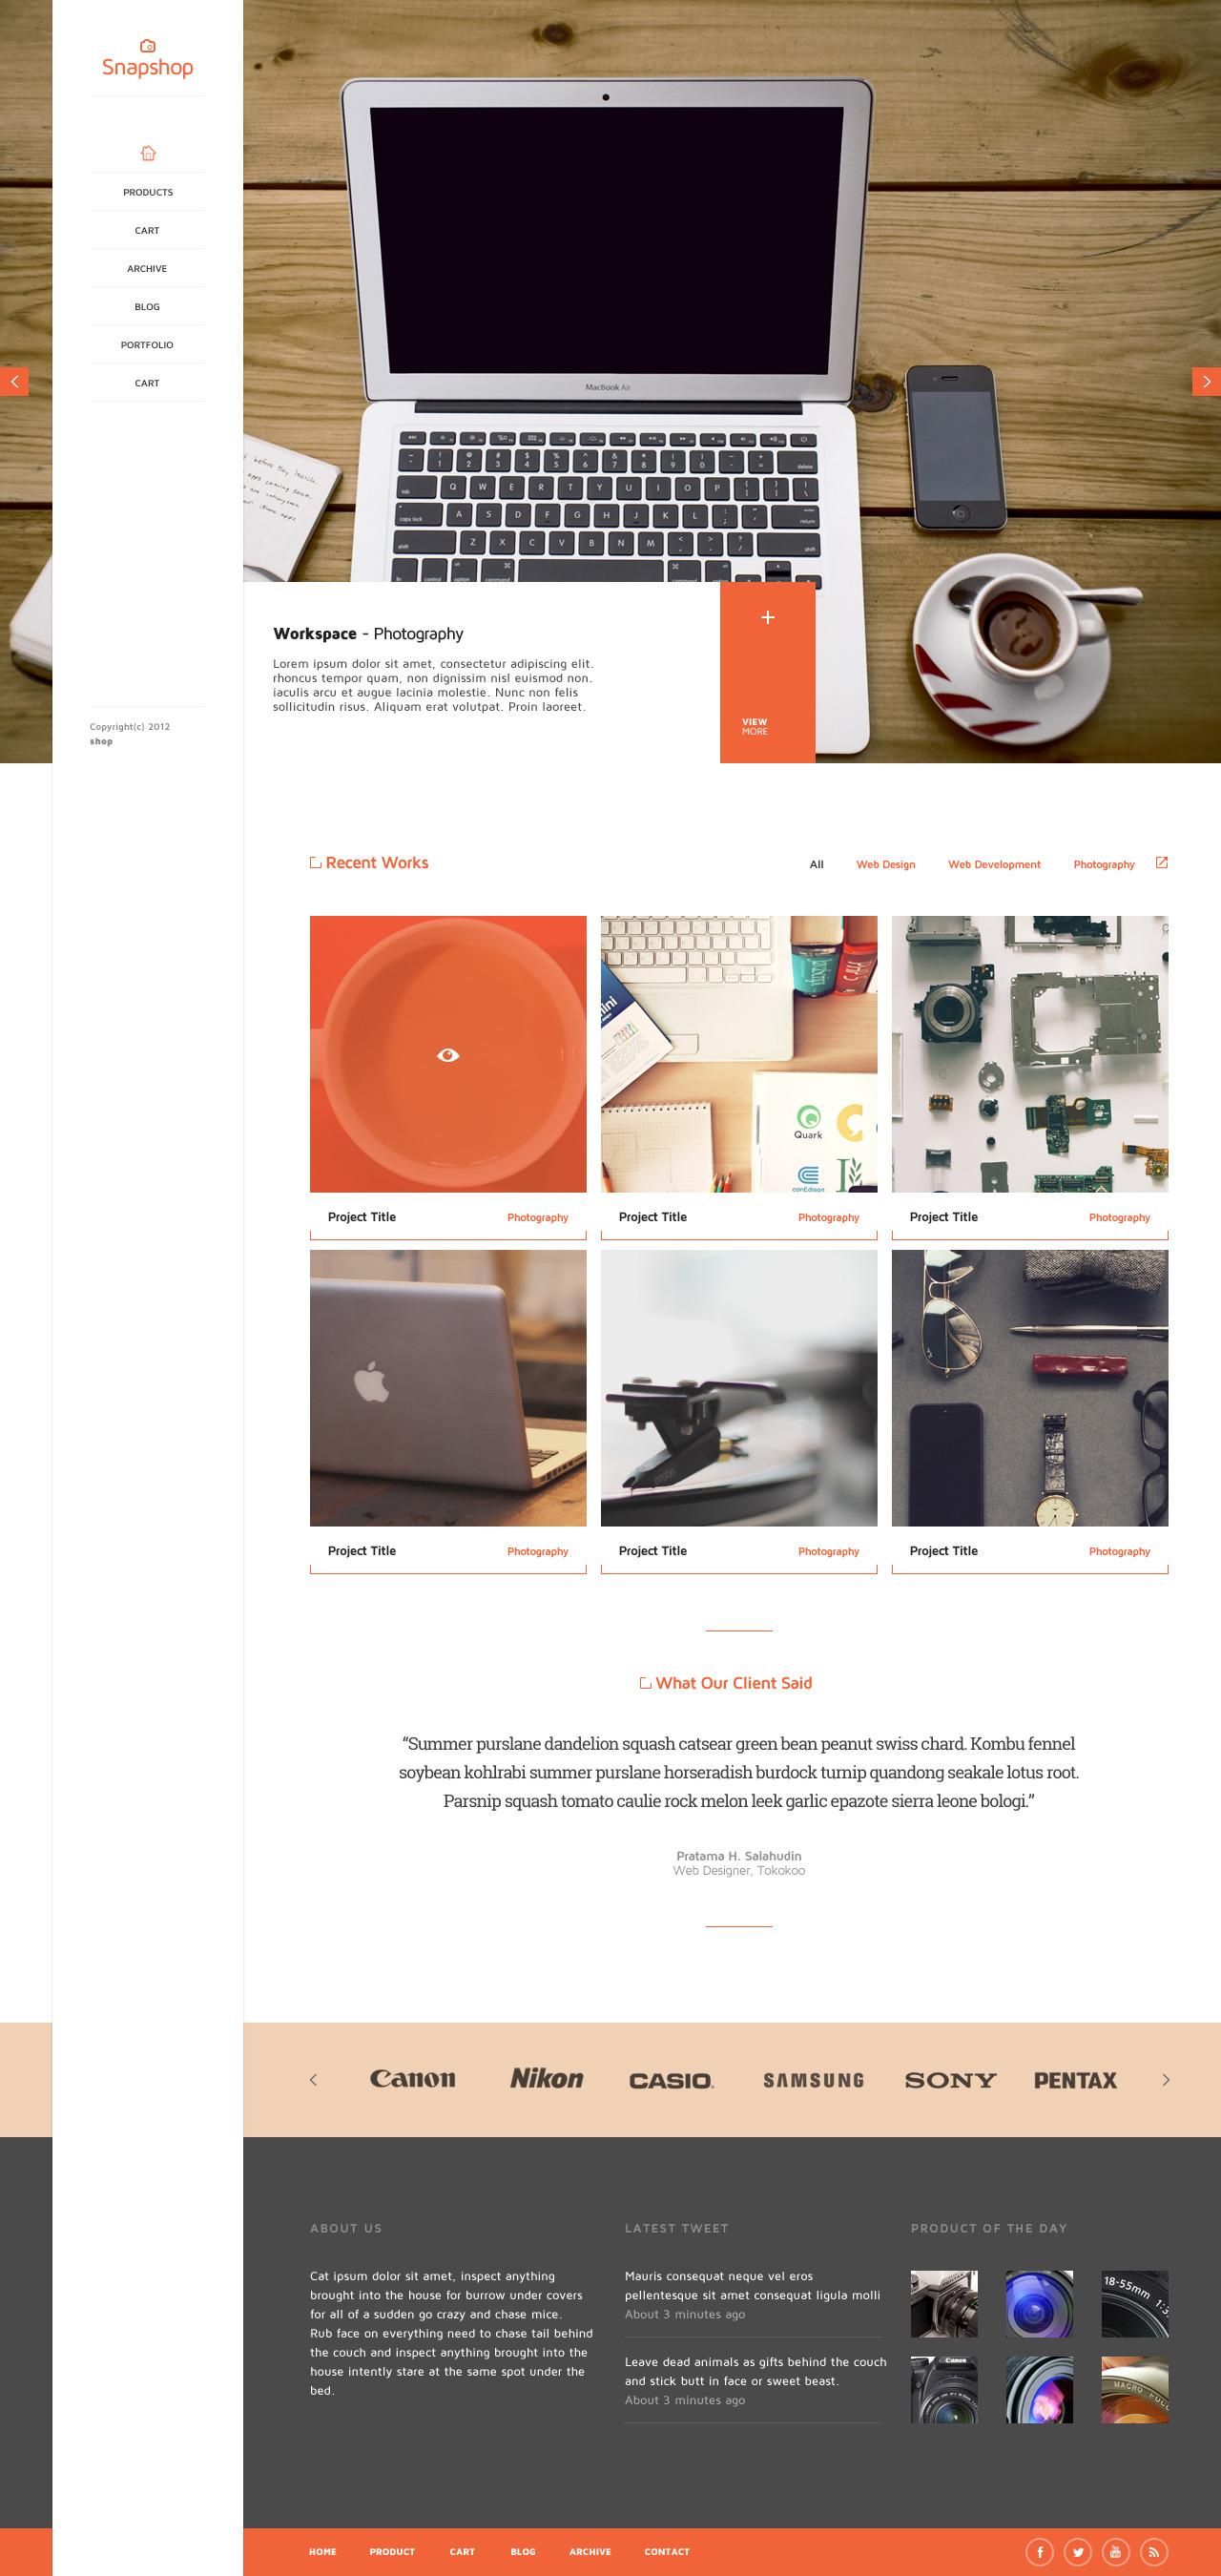 SnapShop - Woocommerce Theme For Gadget Shop